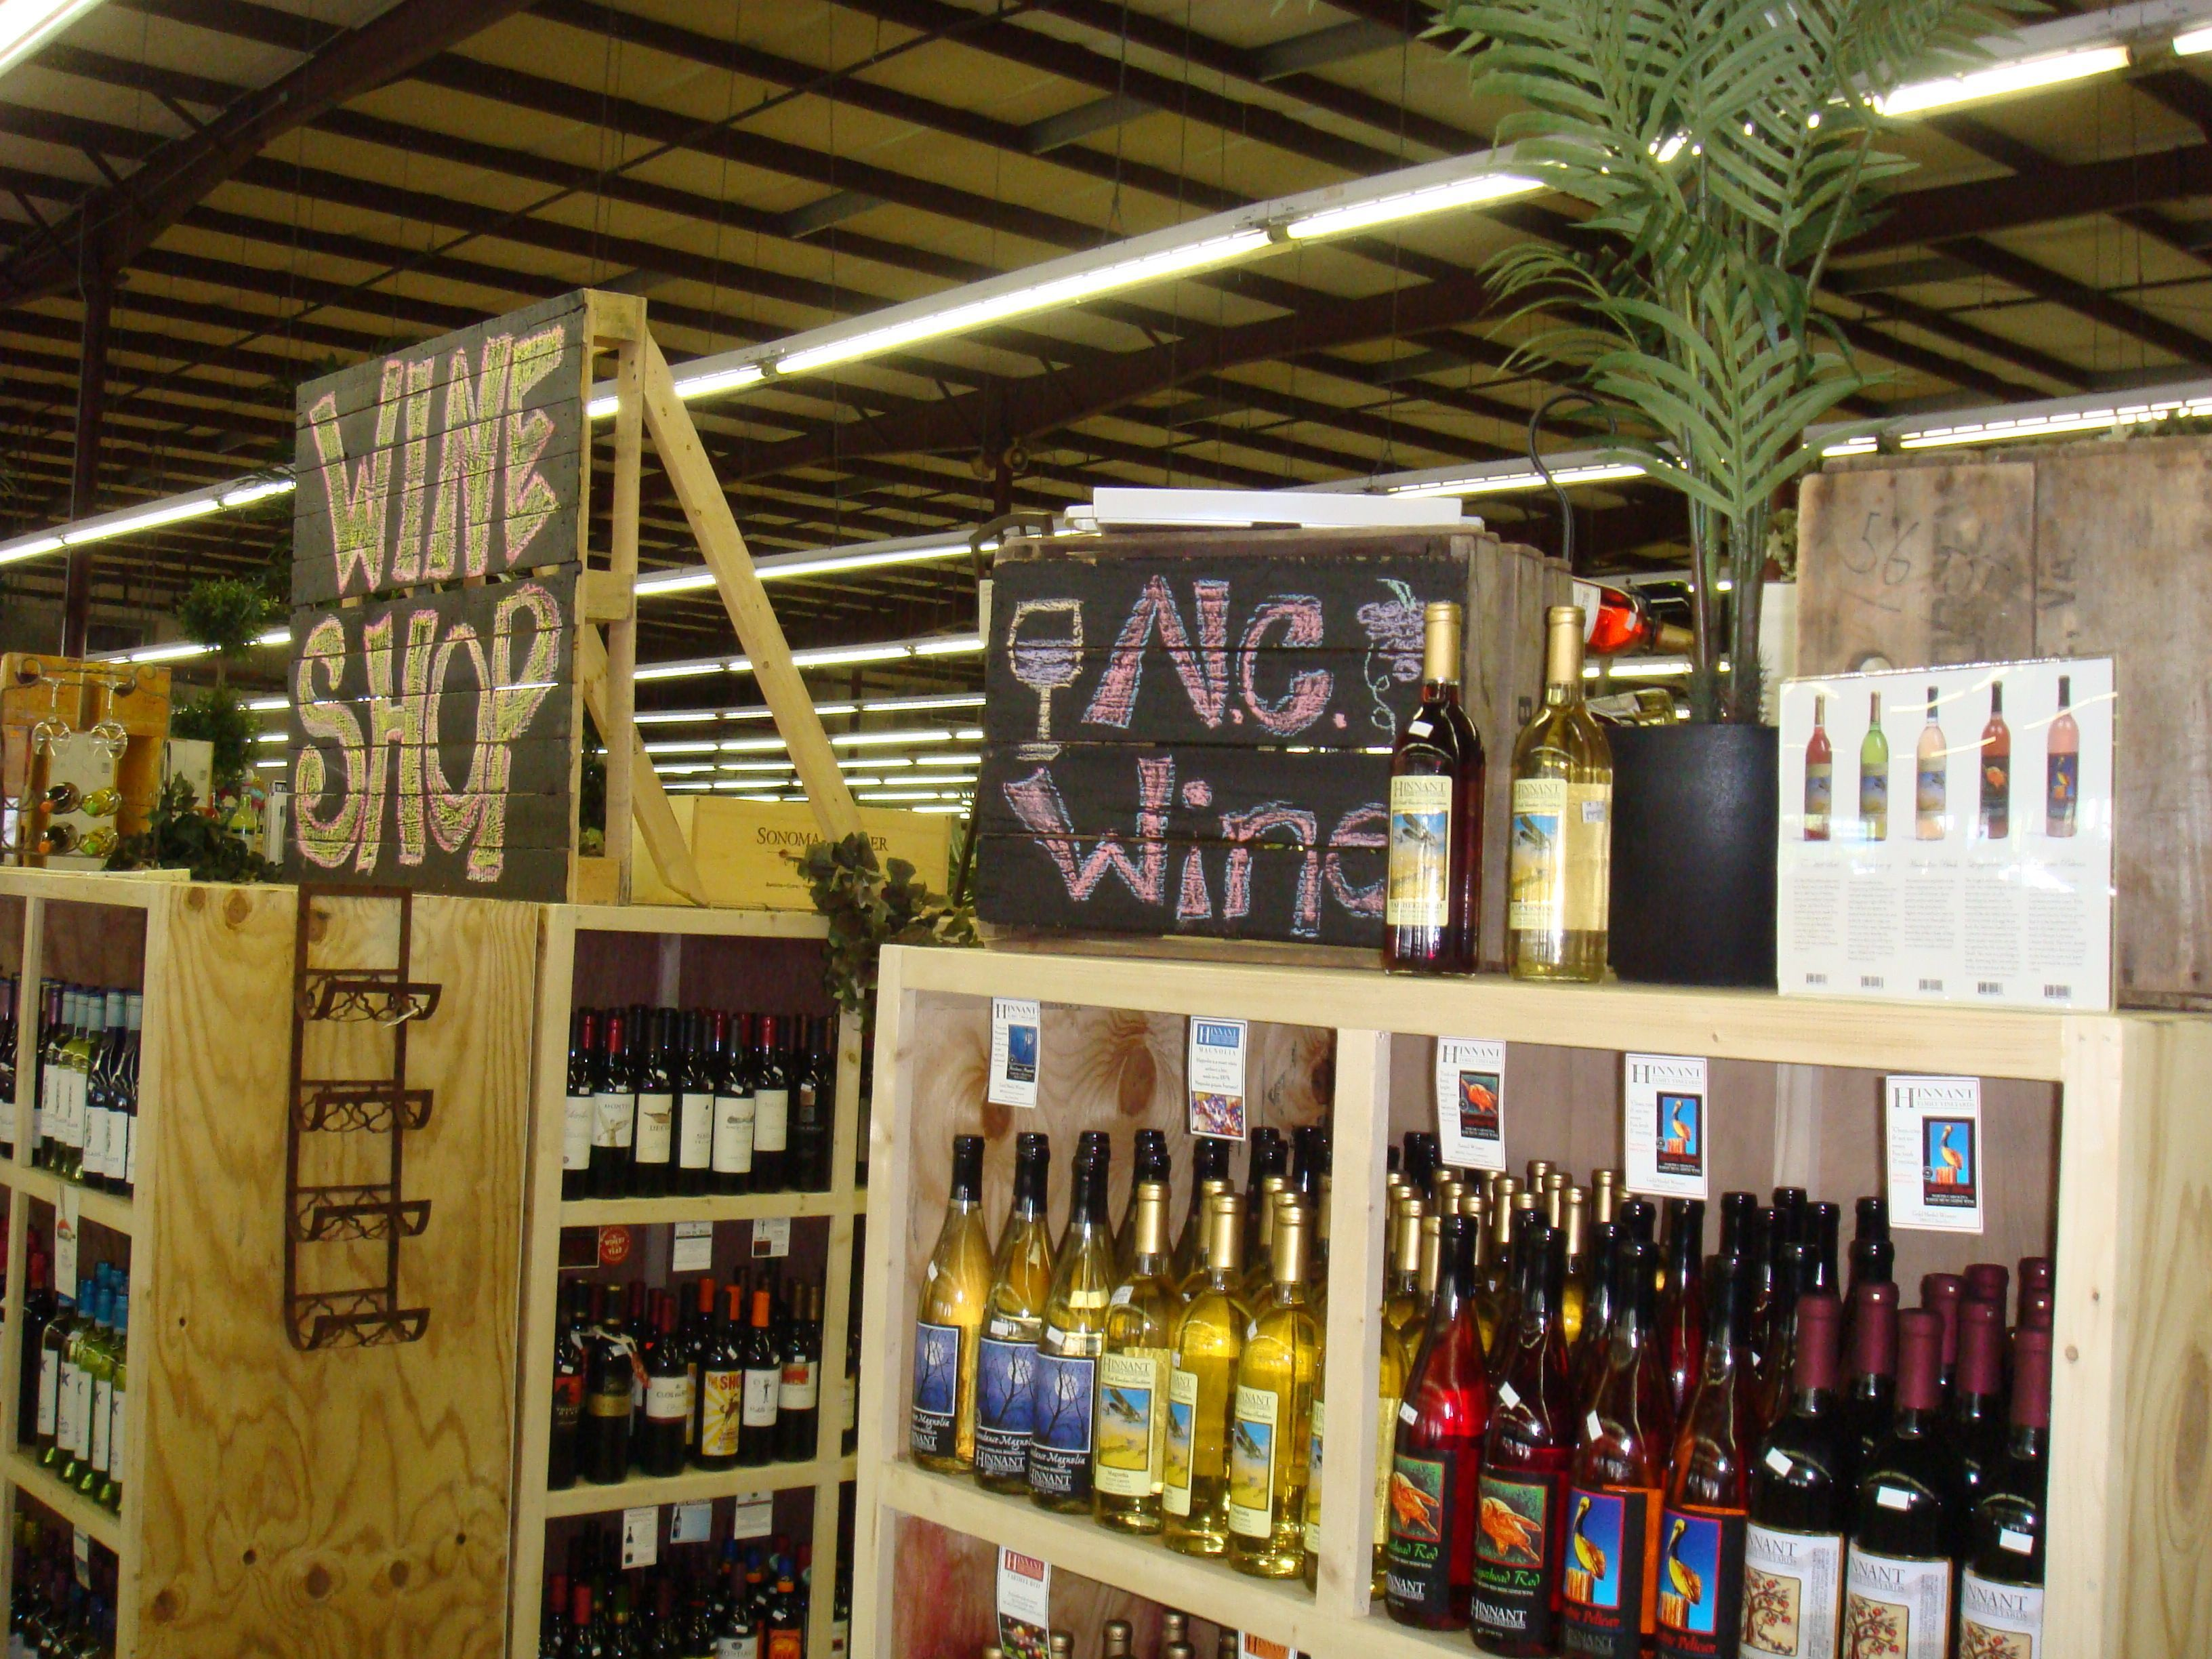 Smithfield, NC Wine rack